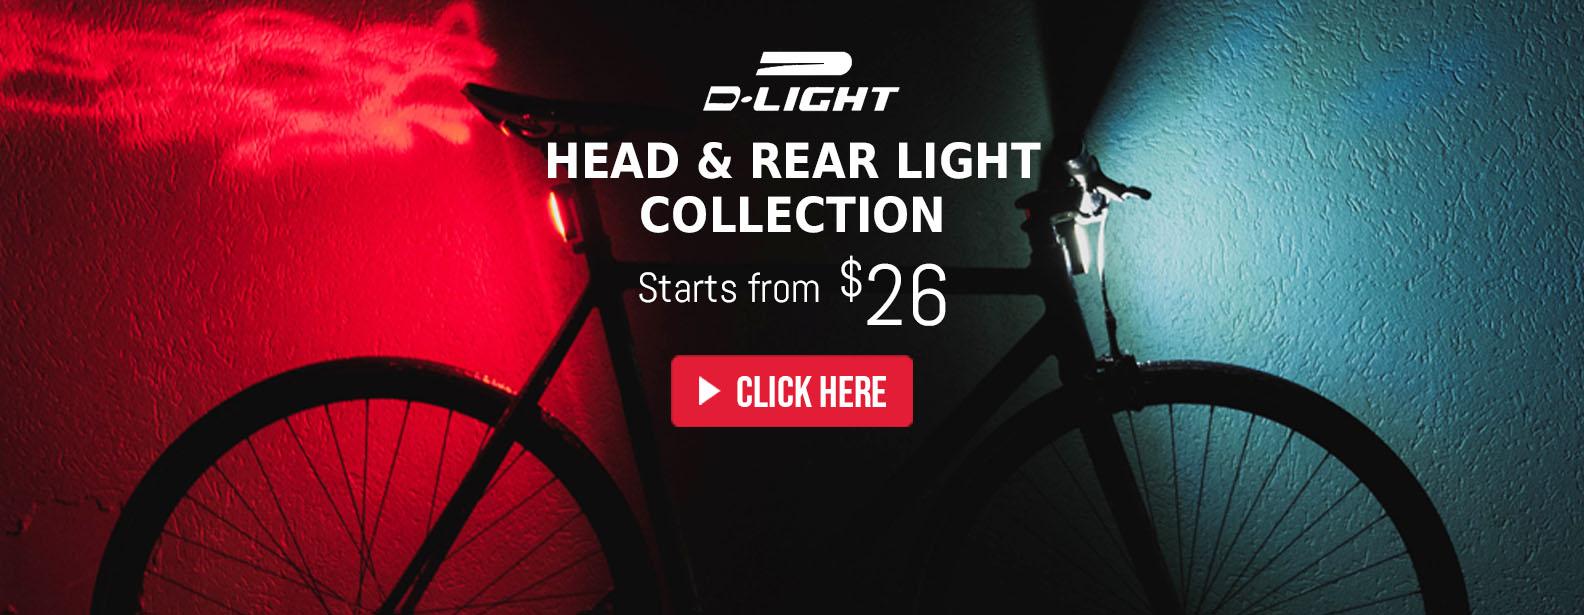 D-Light Head & Tail Light Collecion